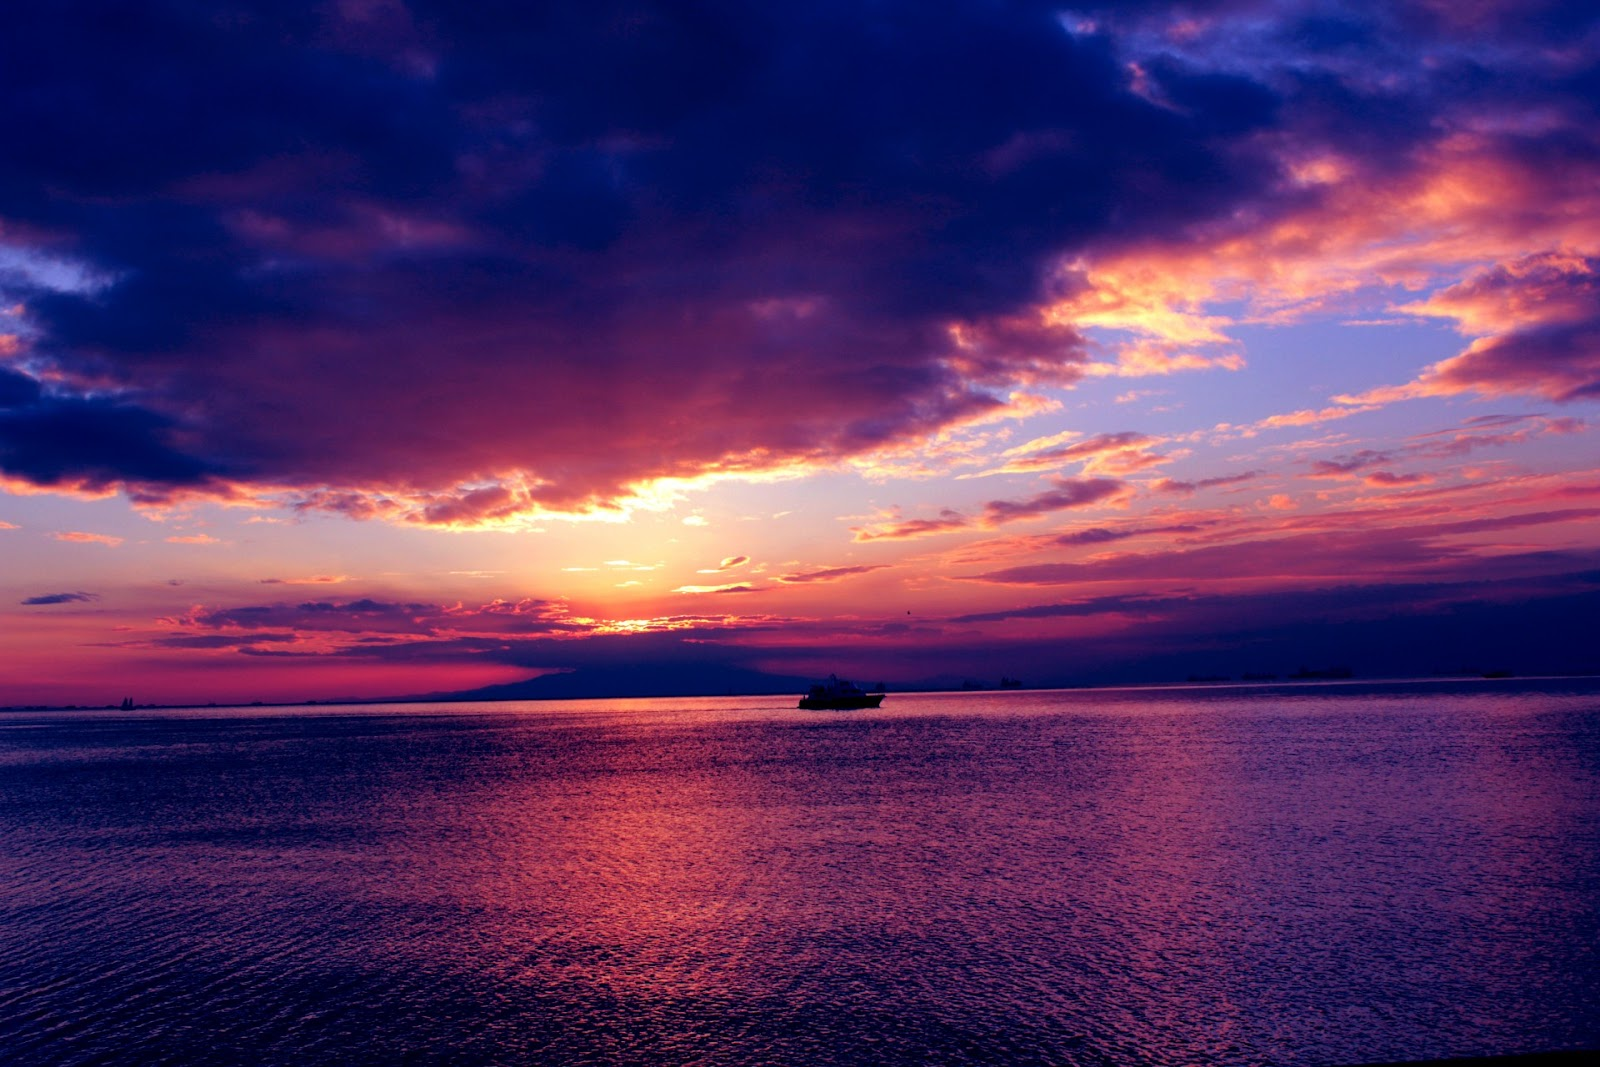 sunset-background-1371188975Z2h.jpg